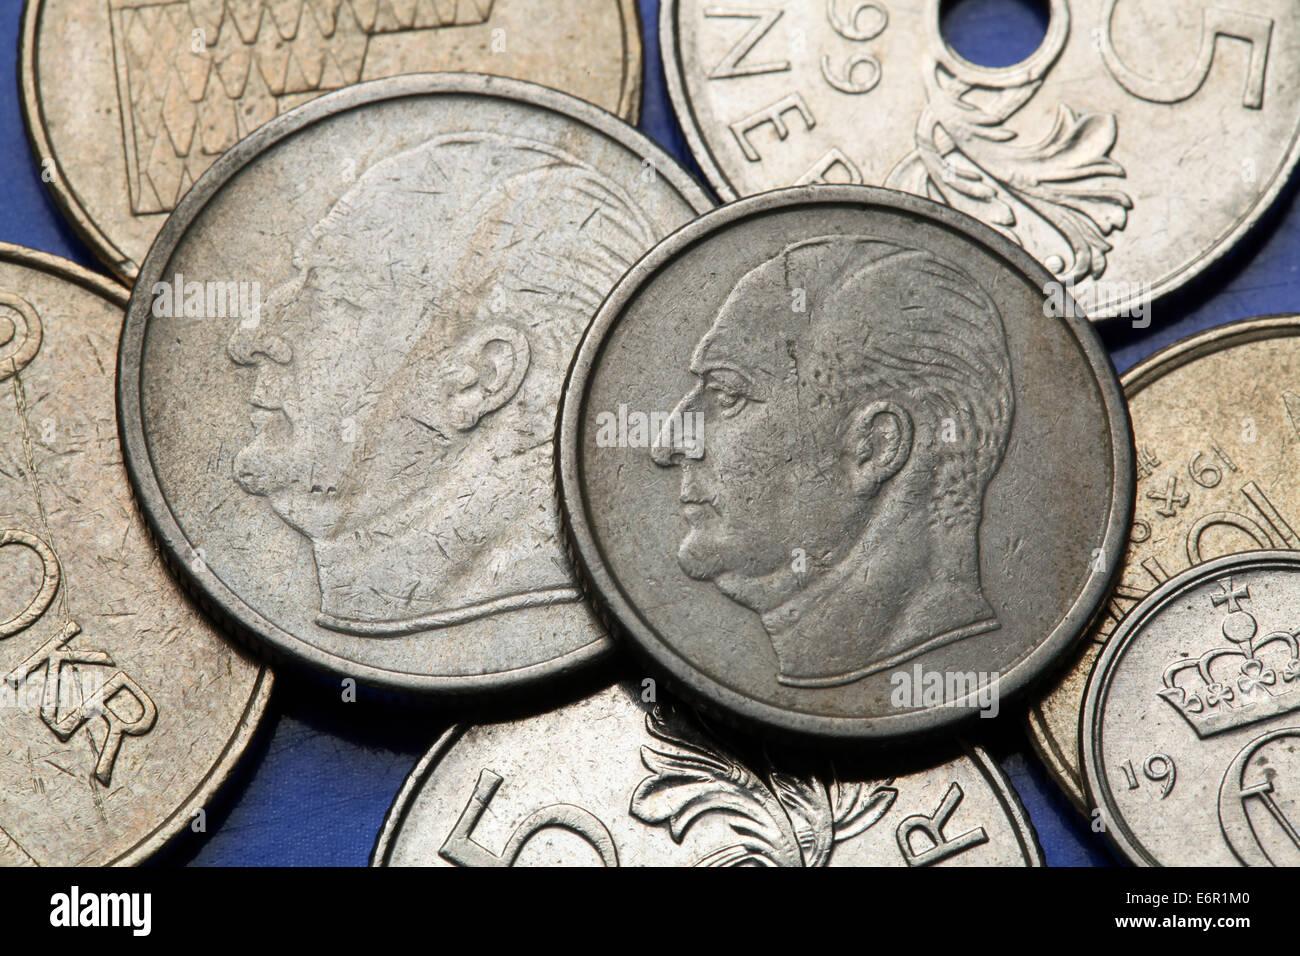 Münzen Von Norwegen König König Olav V Von Norwegen In Norwegische